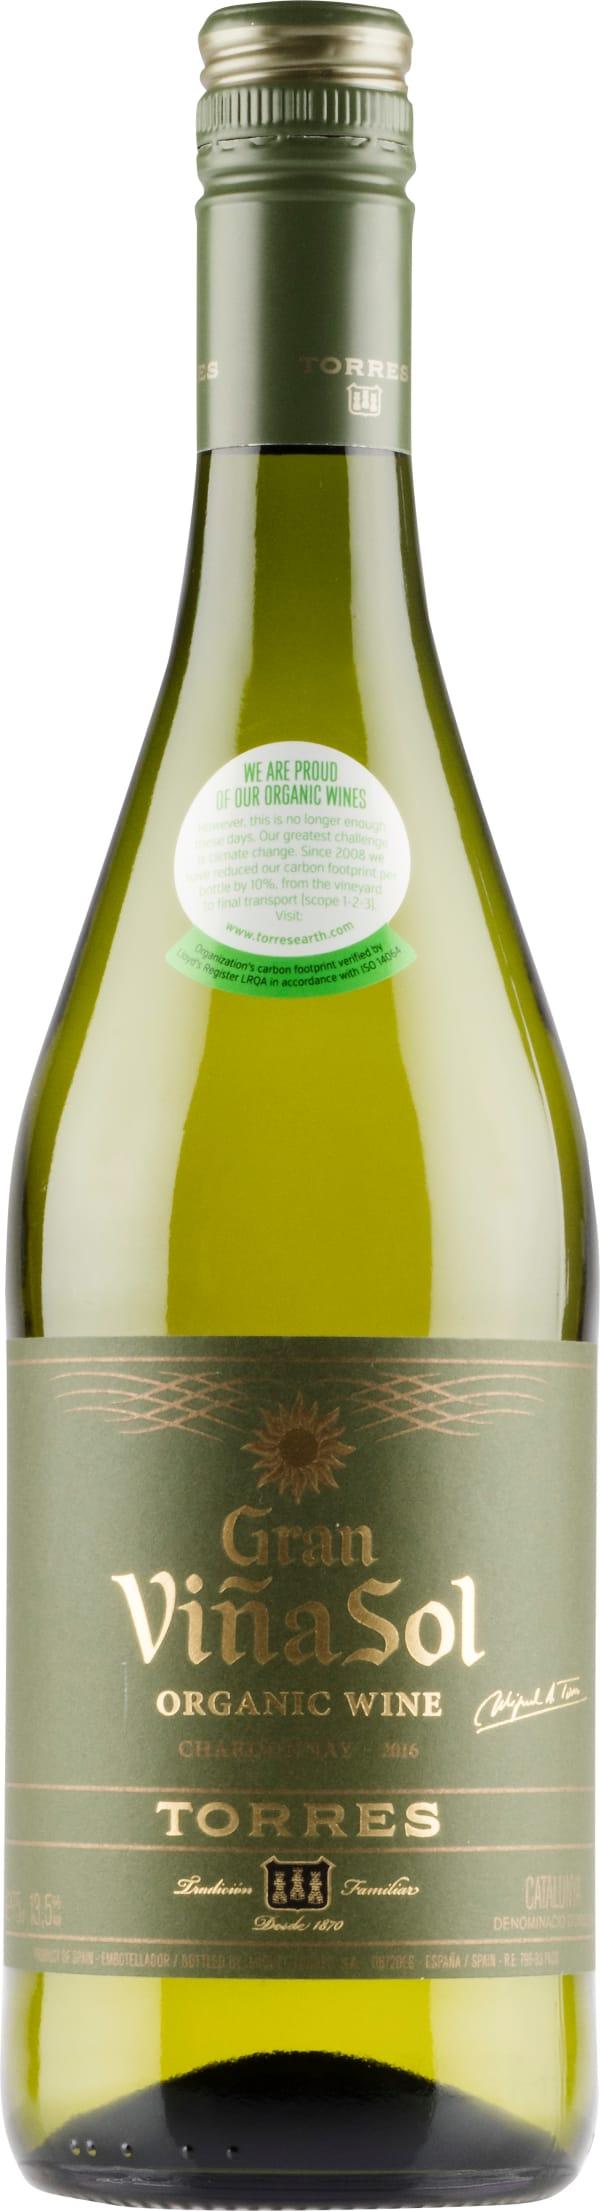 Torres Gran Viña Sol Chardonnay 2018